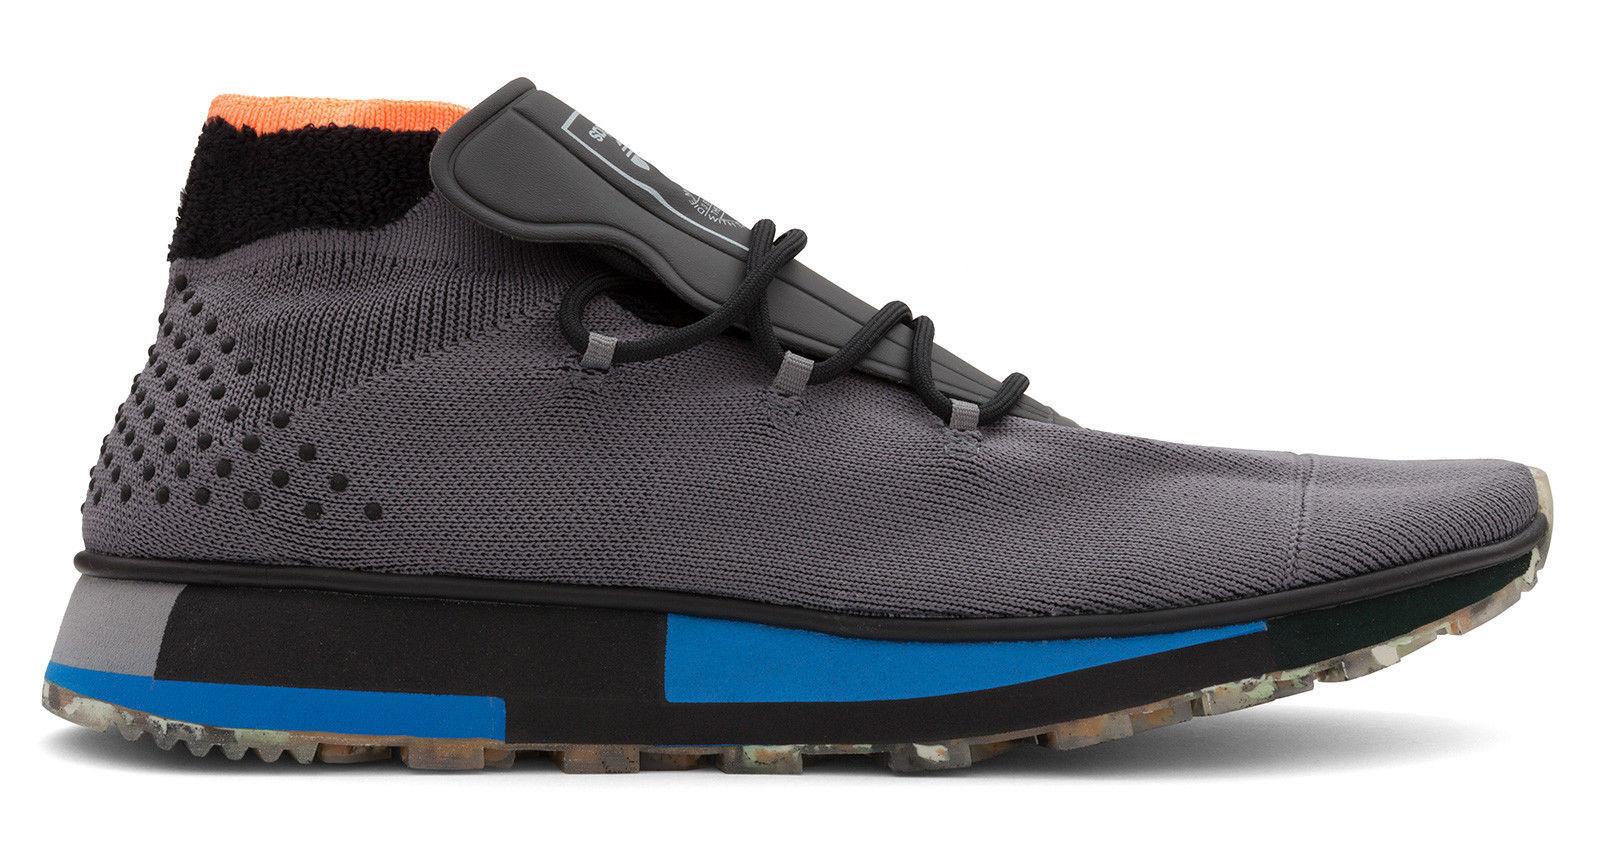 Adidas X  Alexander Wang AW Running Mid scarpe - Dimensione 8.5 scarpe Unisex  wholesape economico